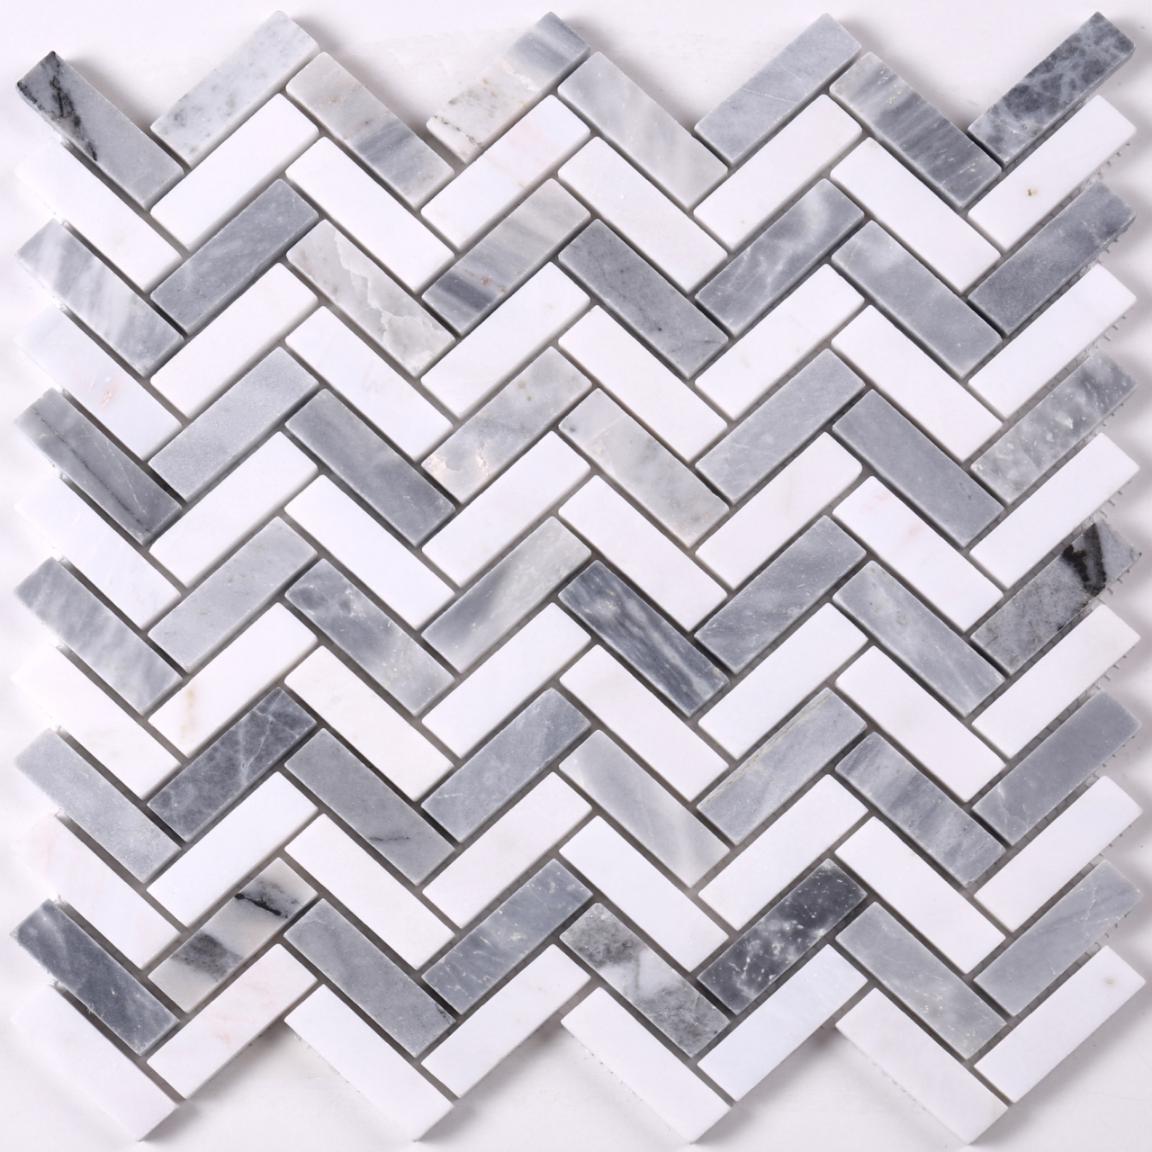 Heng Xing-Stone Mosaic Tile Manufacturer, Carrara Marble Mosaic Tile | Heng Xing